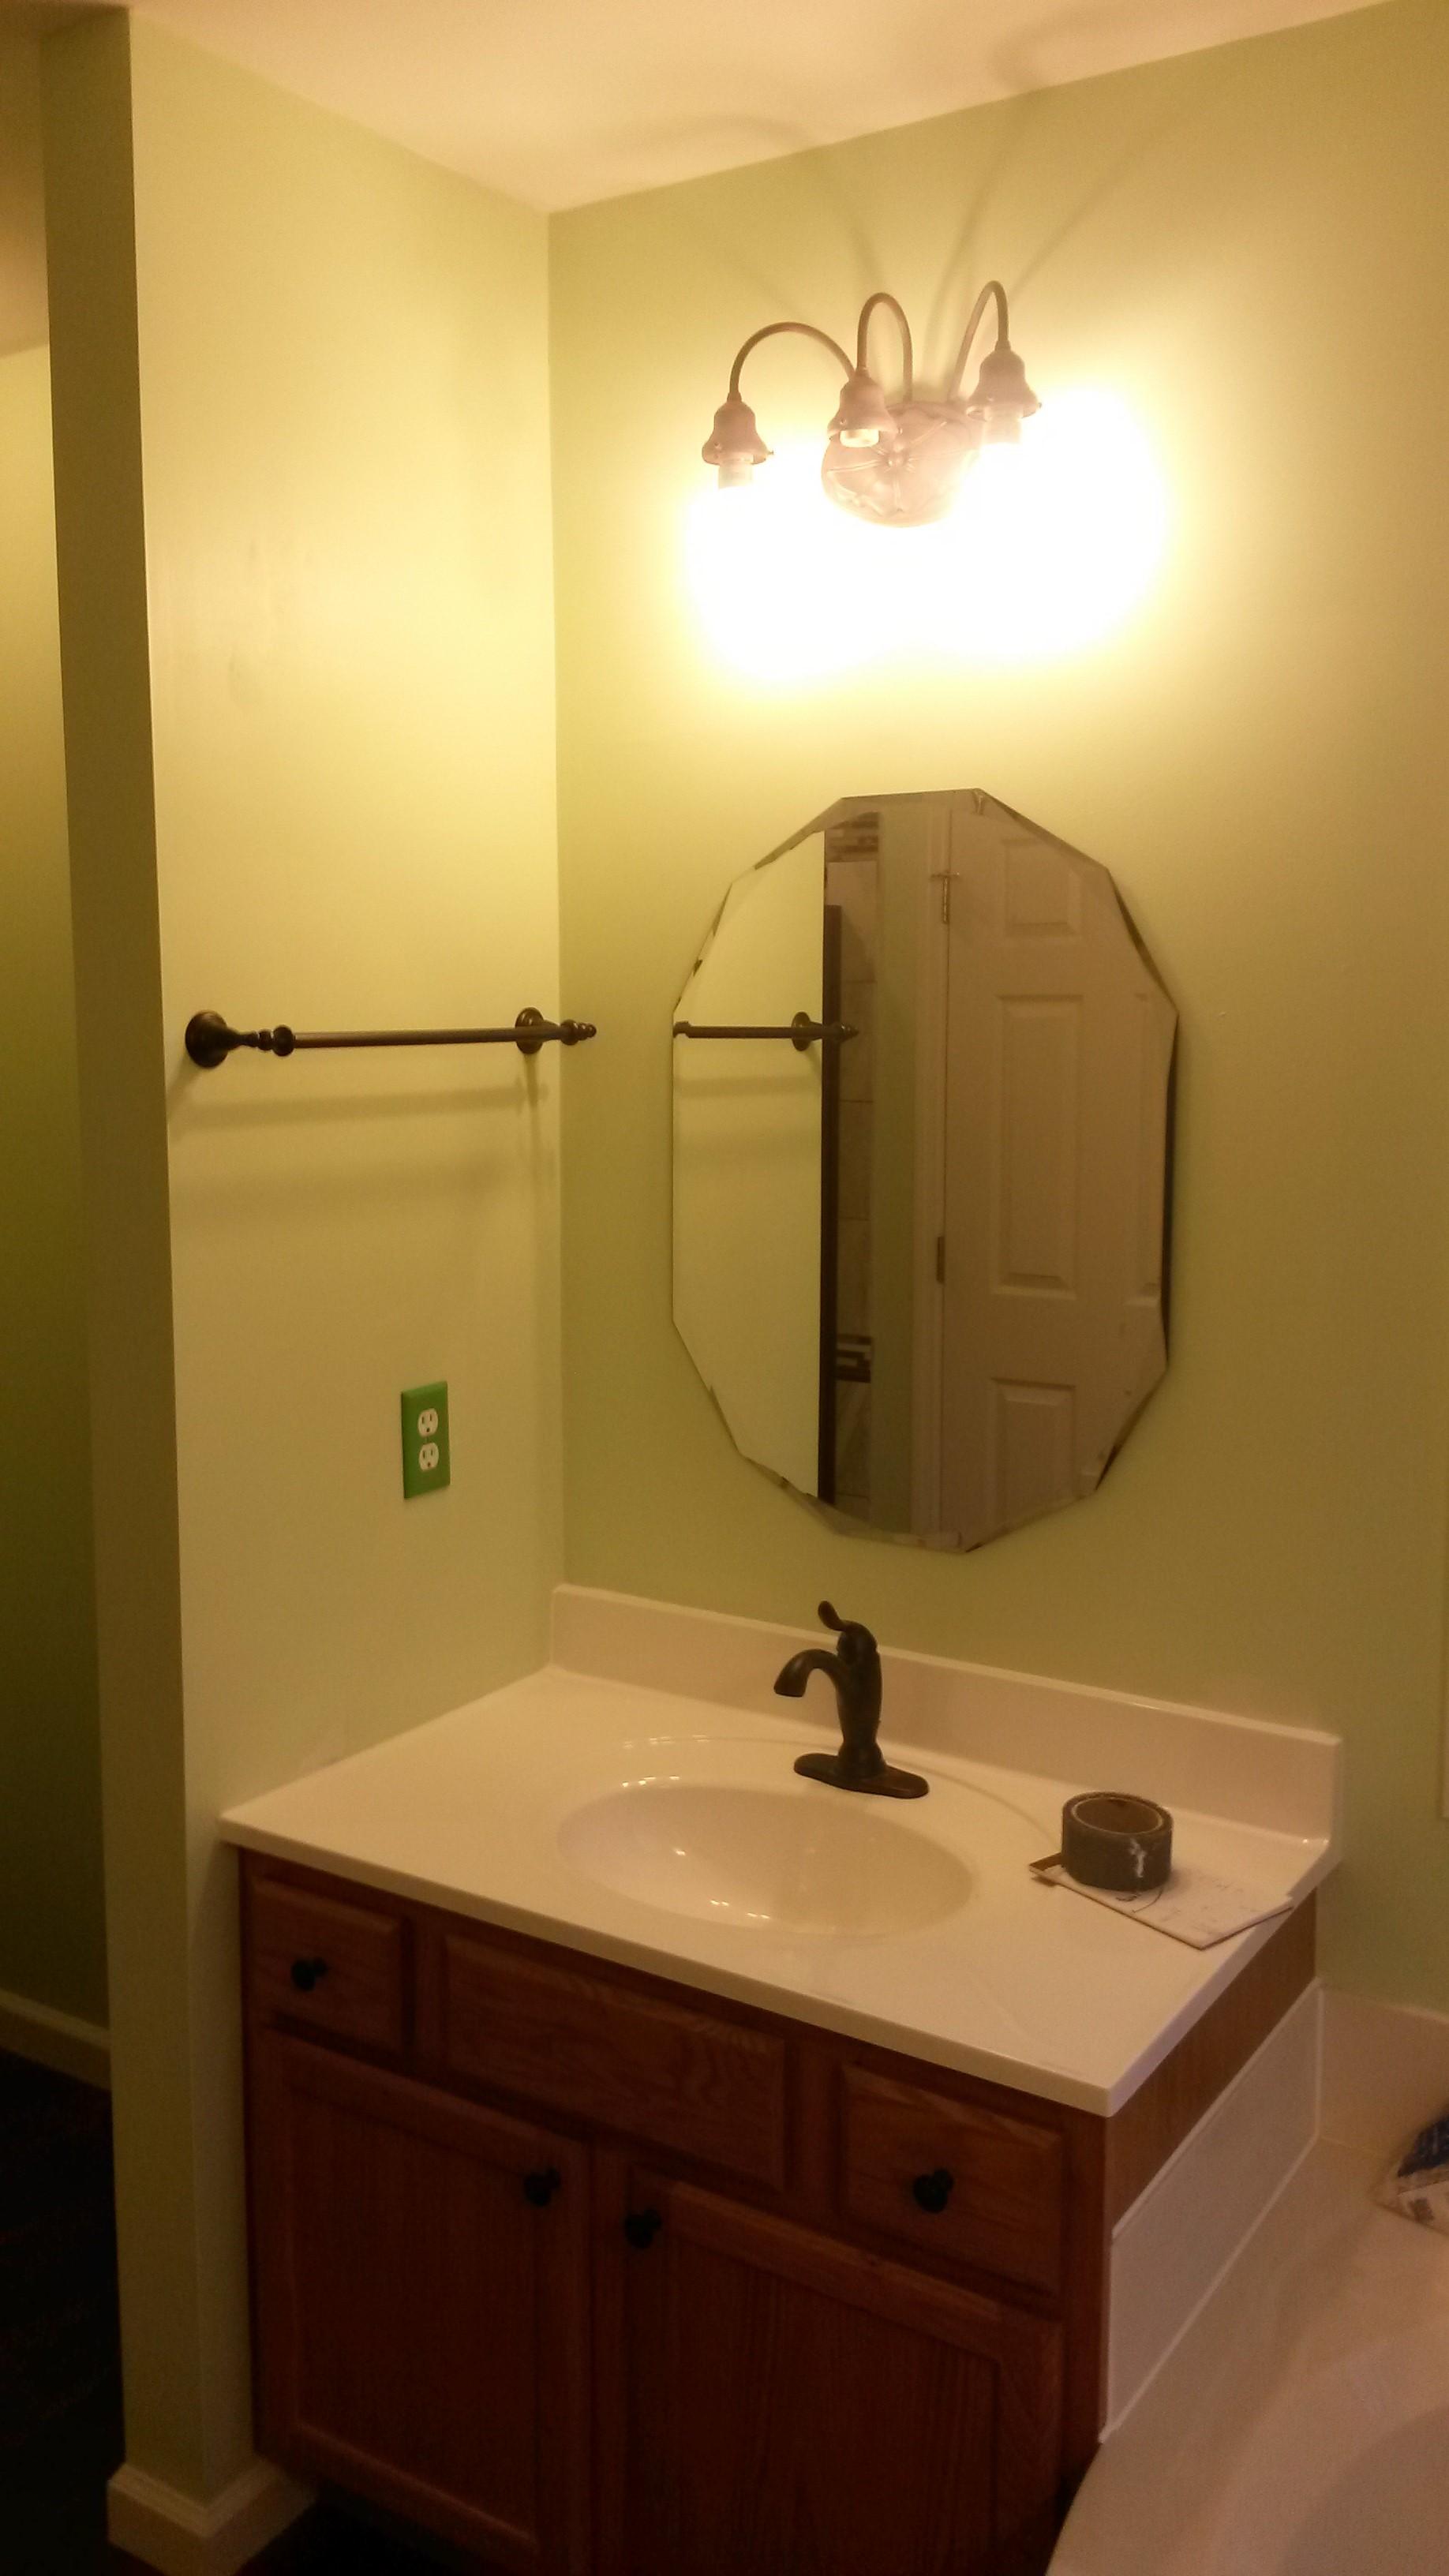 Bathroom Sink Turning Yellow bathrooms – mister fix-it